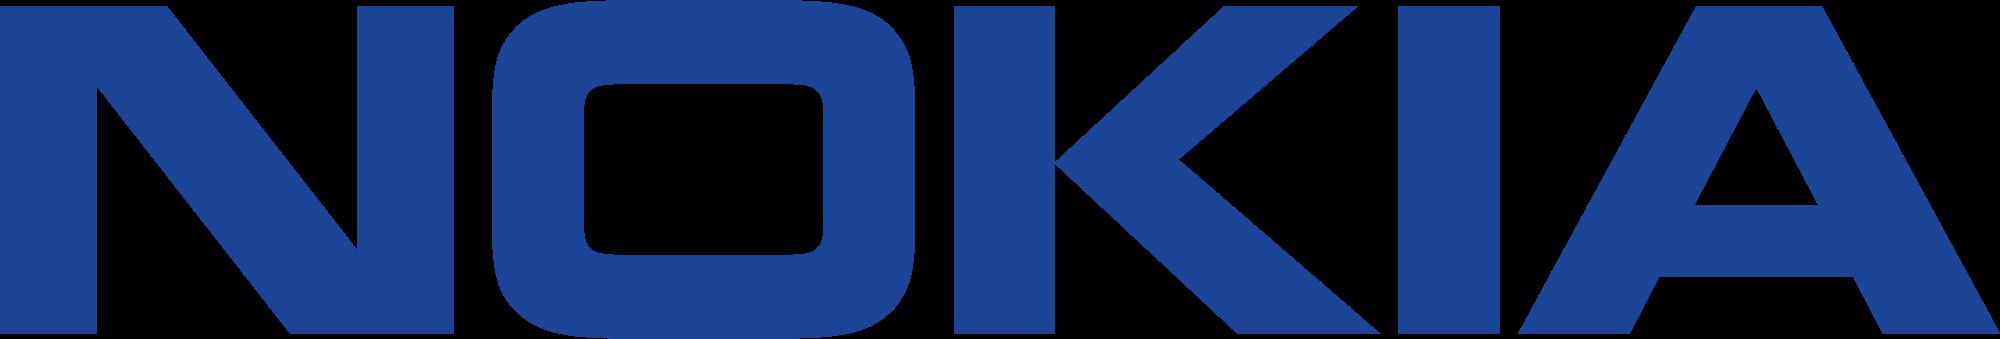 498675 Nokia logo - Boosting indoor capacity with Femtocells